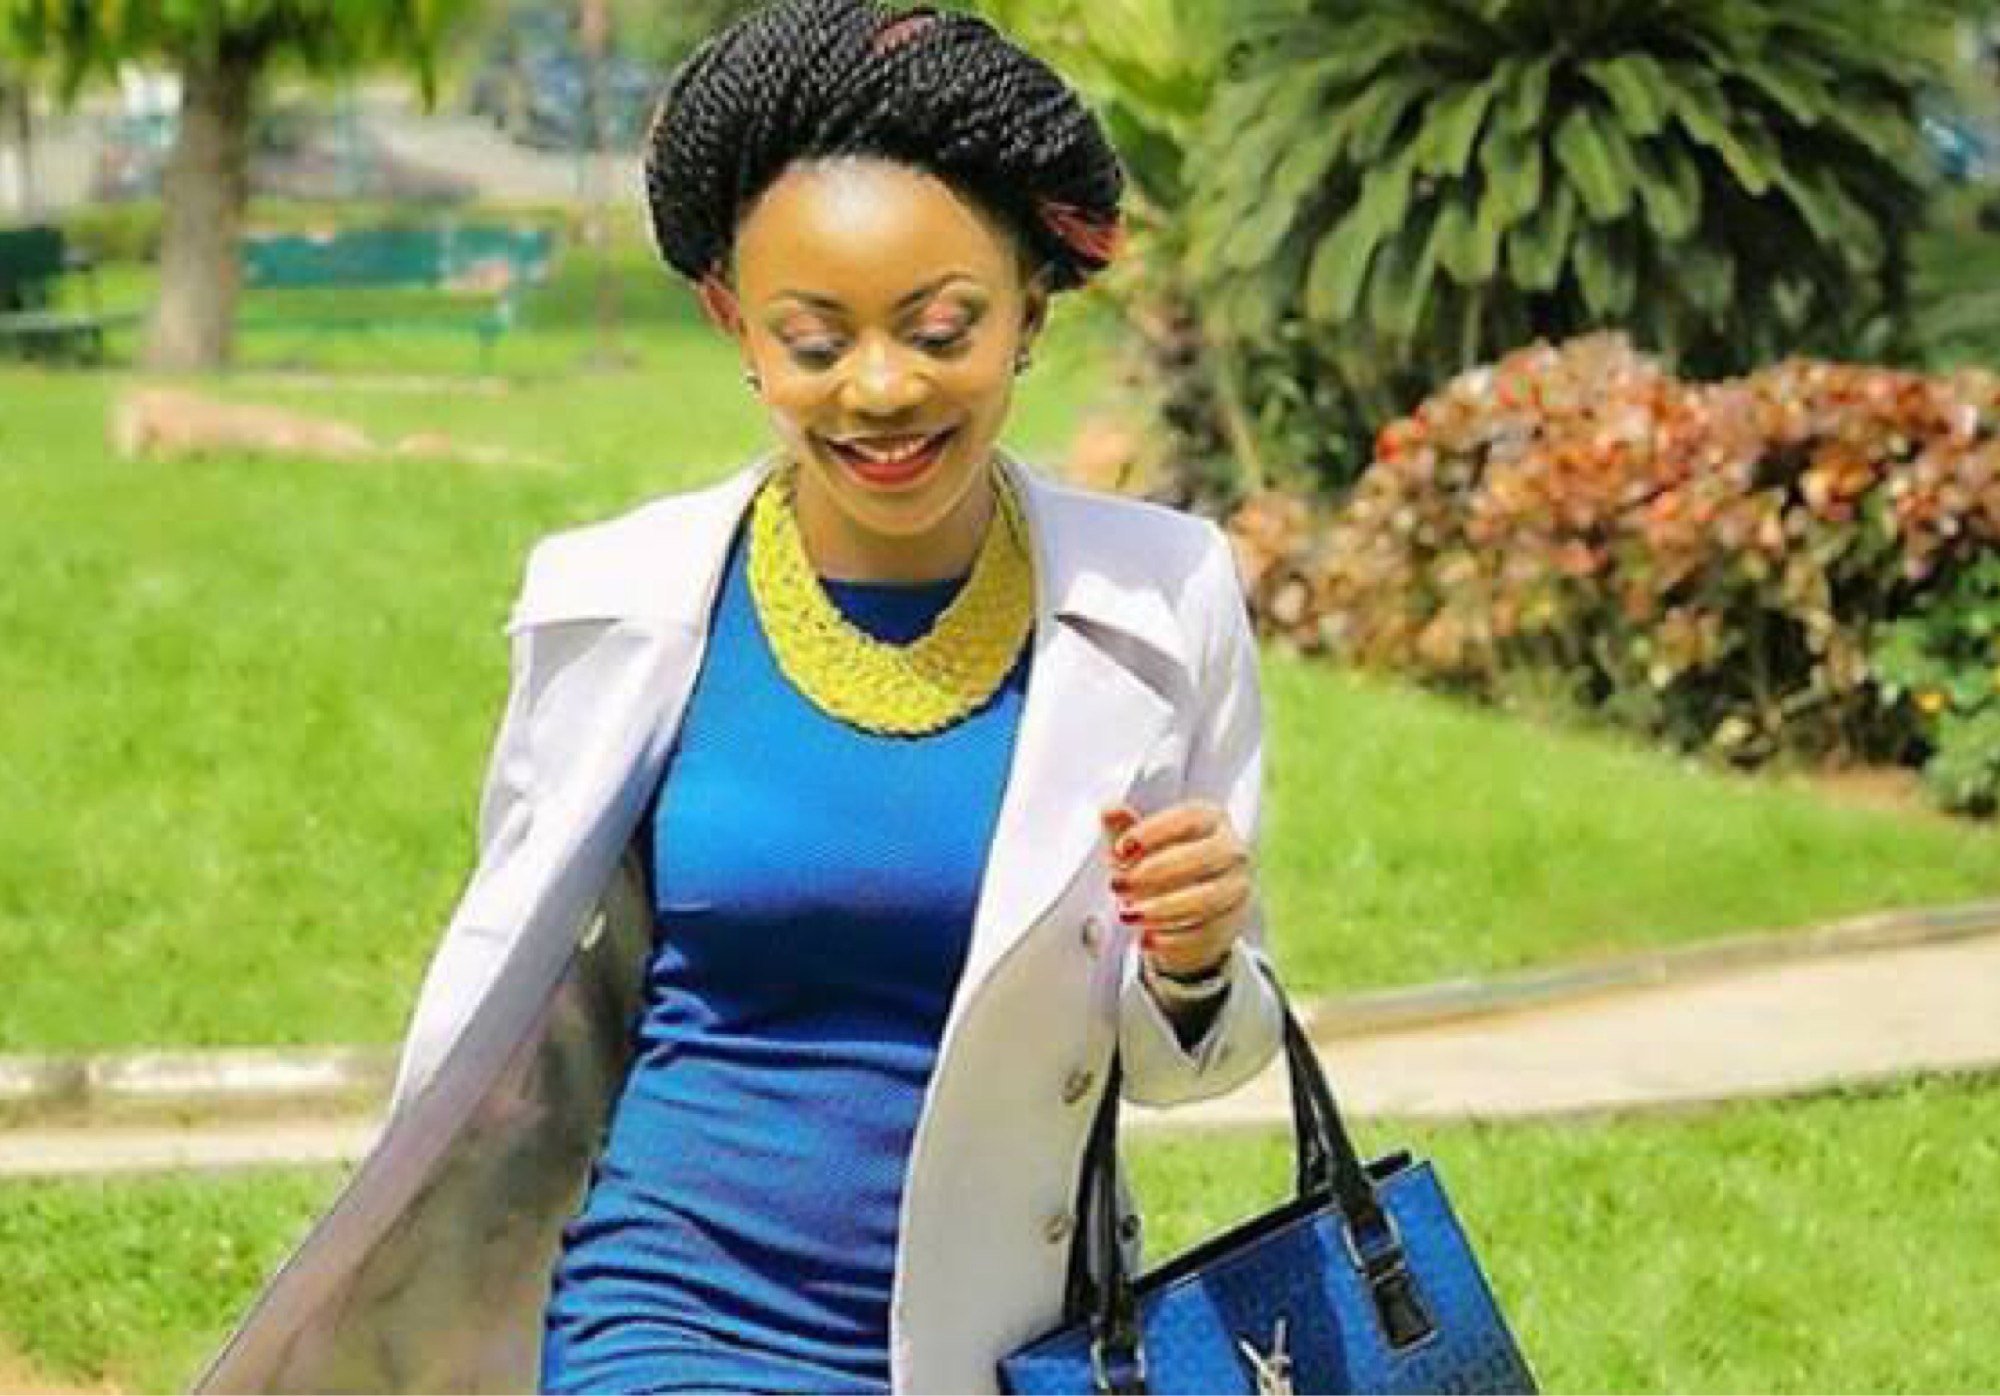 BBNaija's Ifu Ennada Vows Not To Date Nigerian men